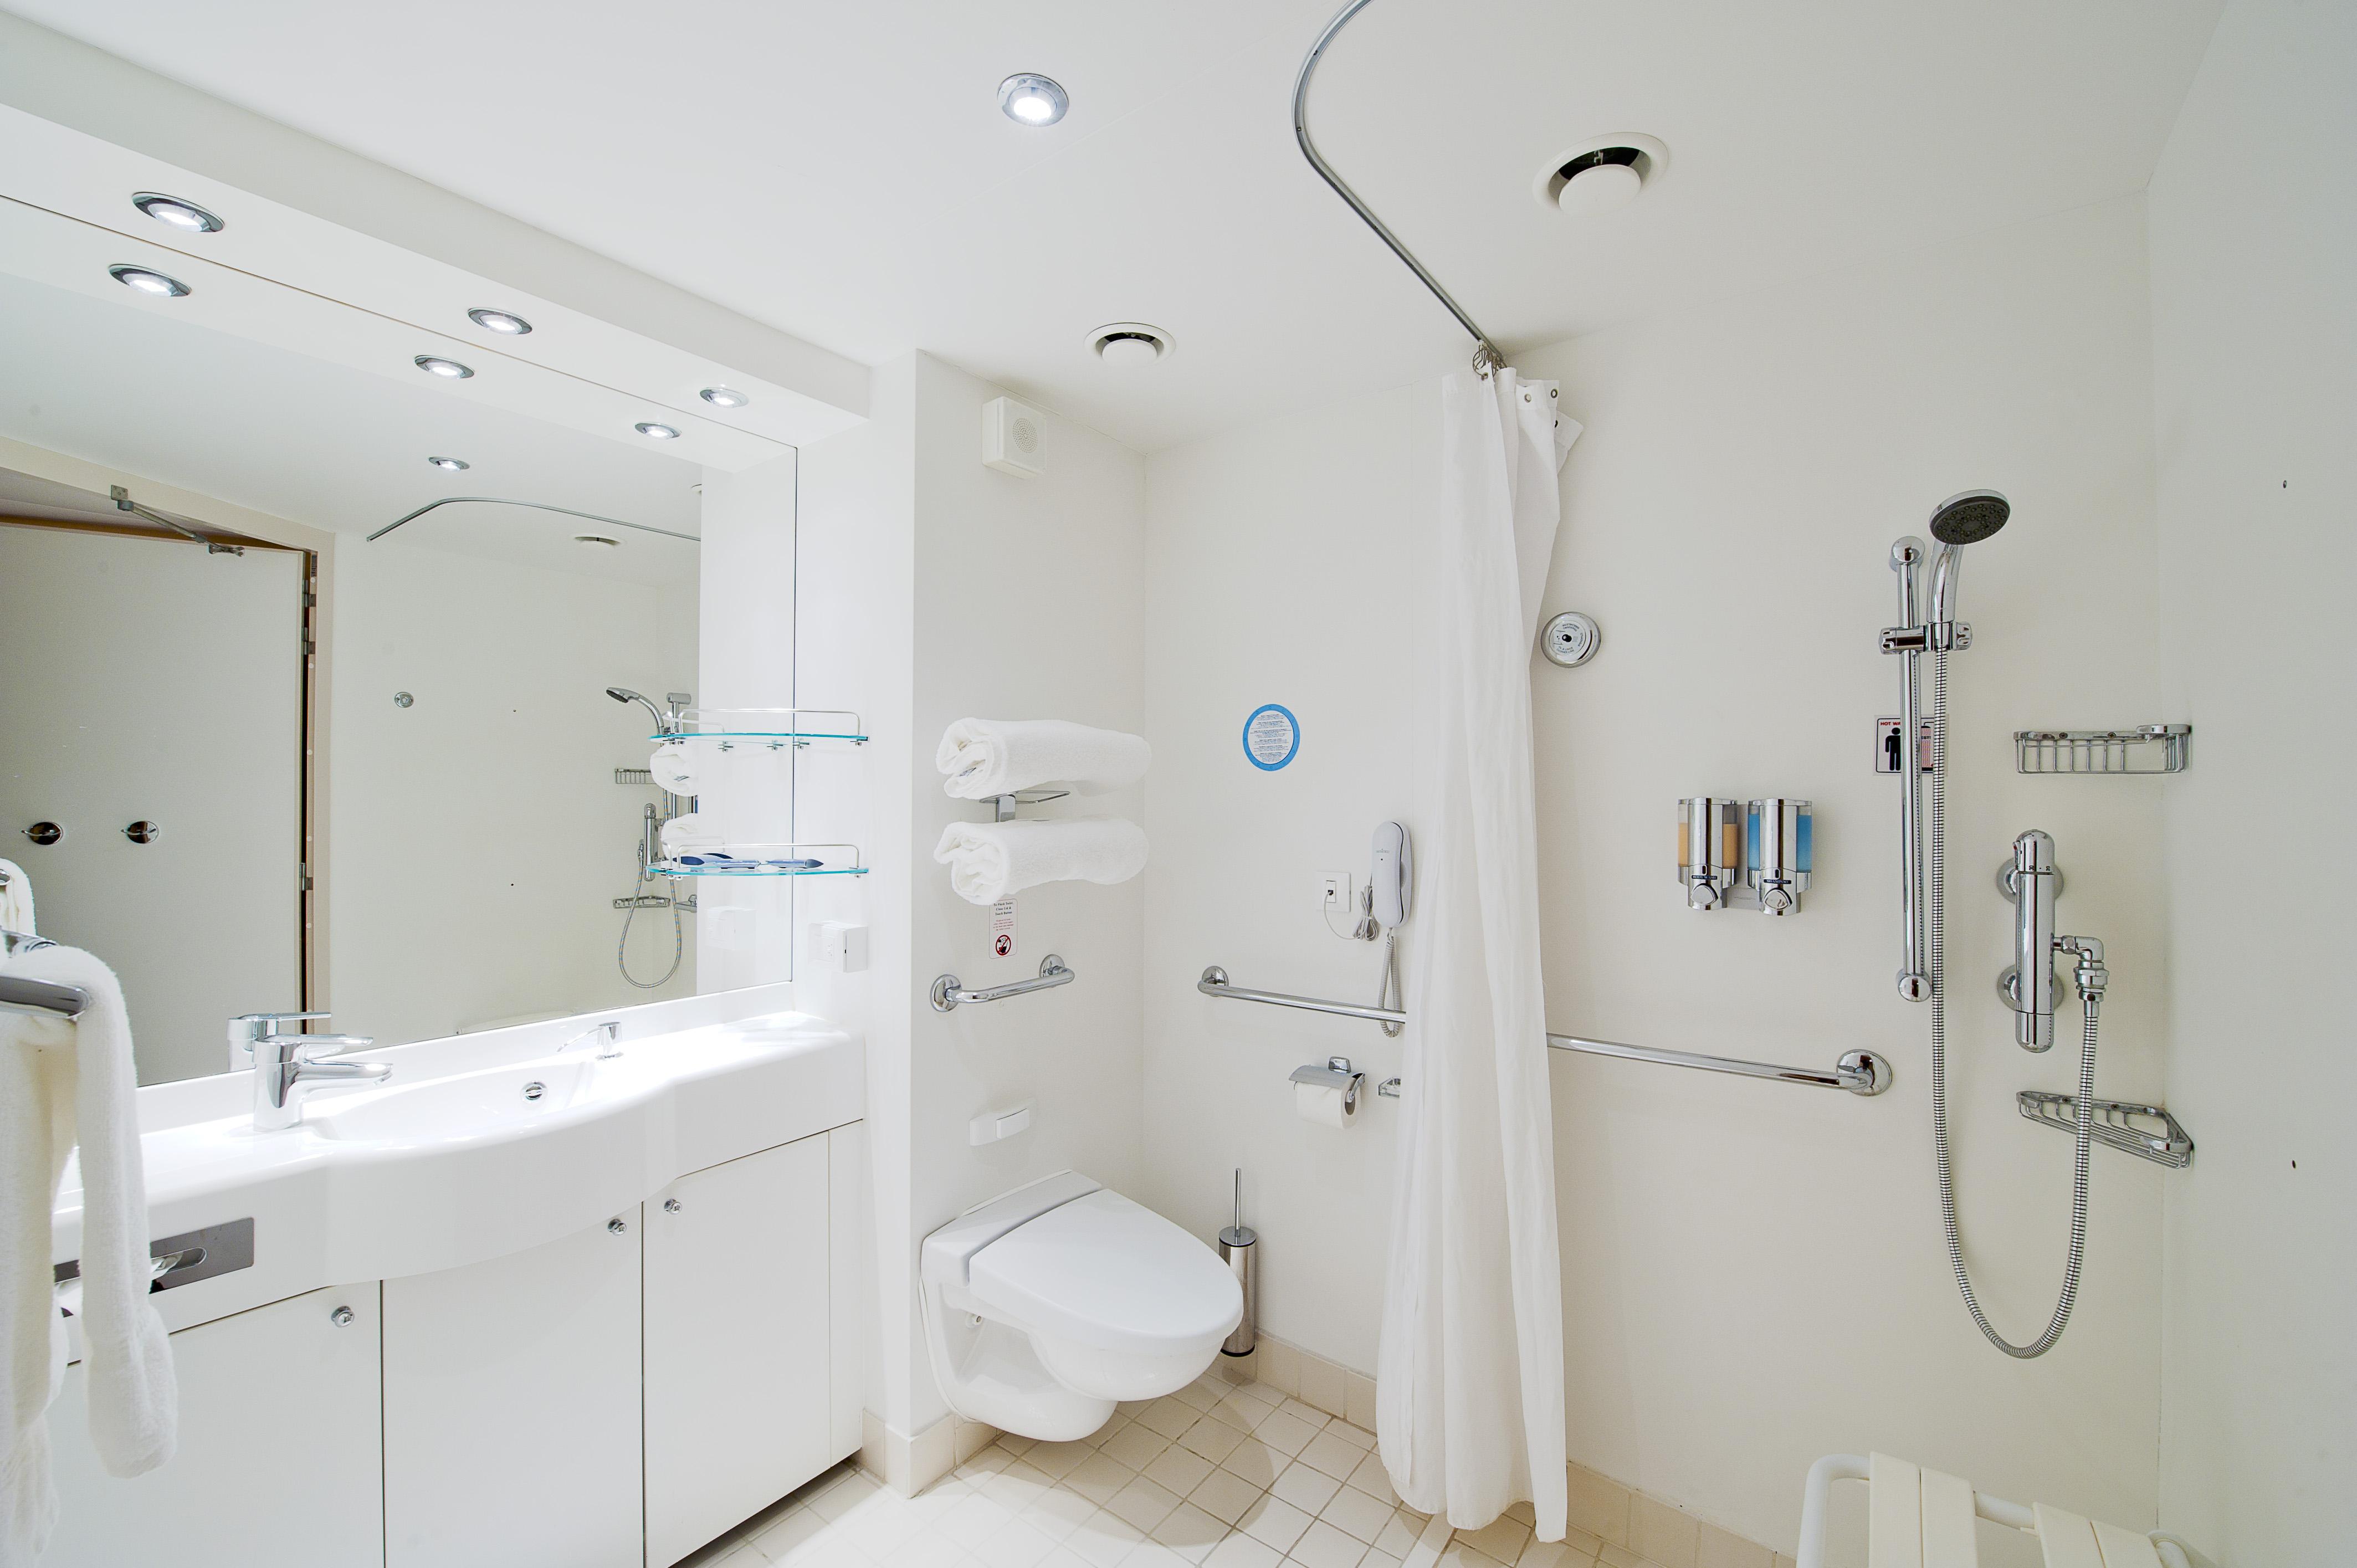 MSC Musica Class accessible bathroom.jpg